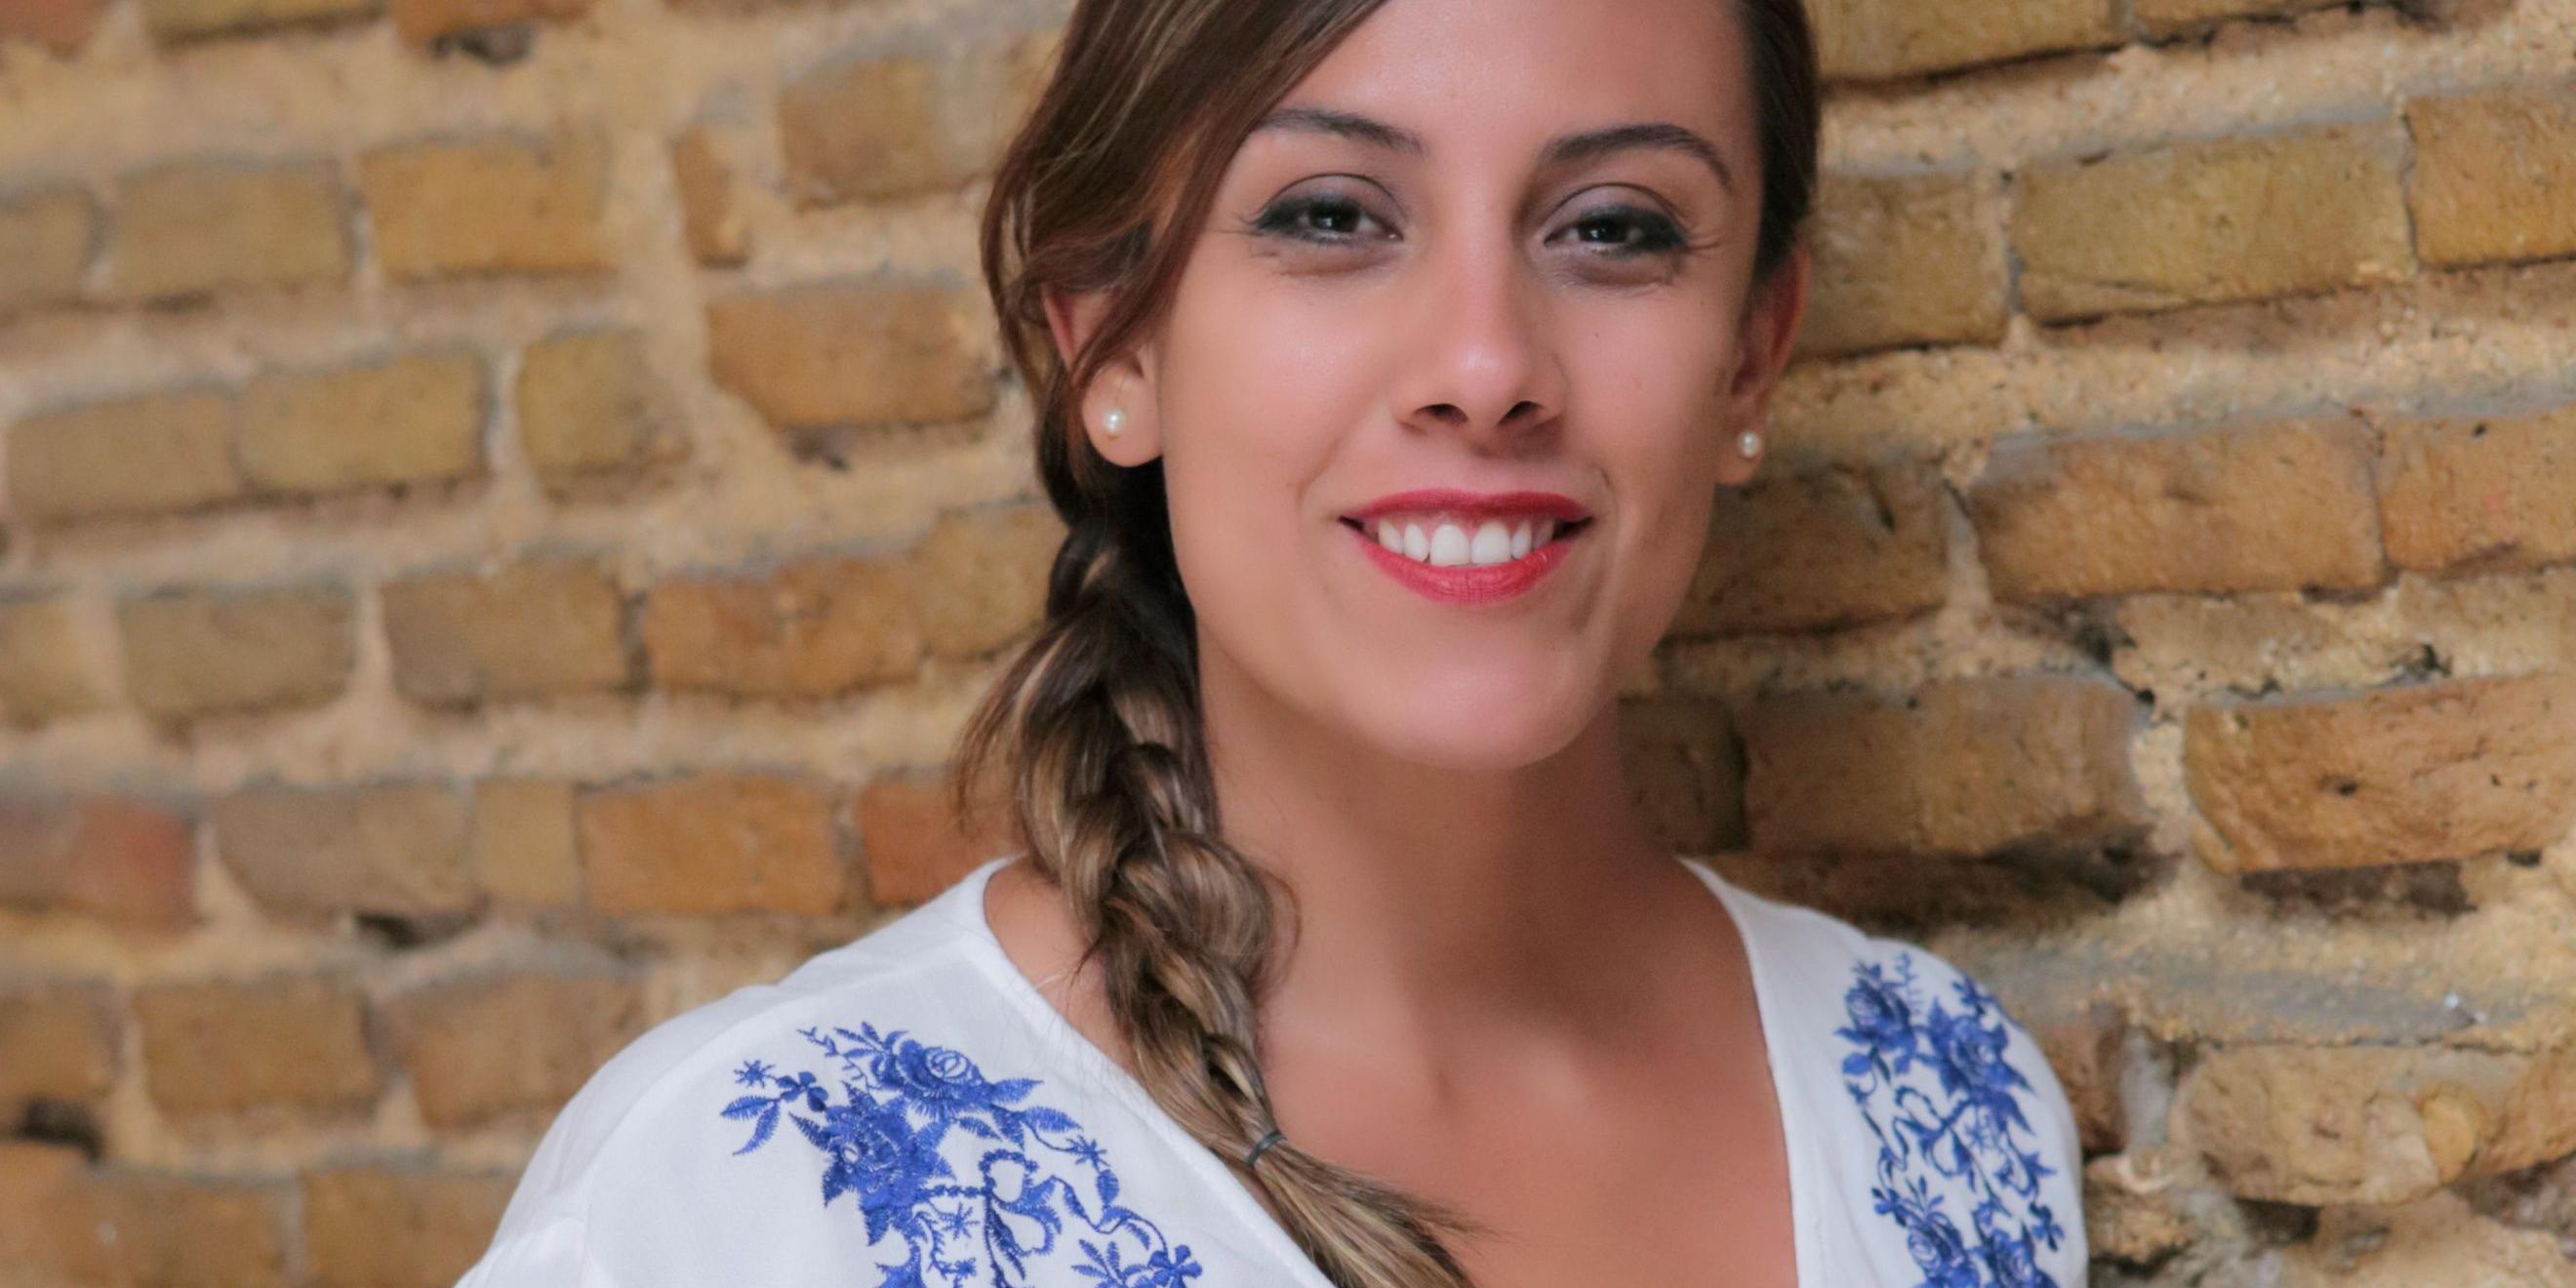 Gabriela Escatell, Mexico, participant in the GCLP 2017 edition